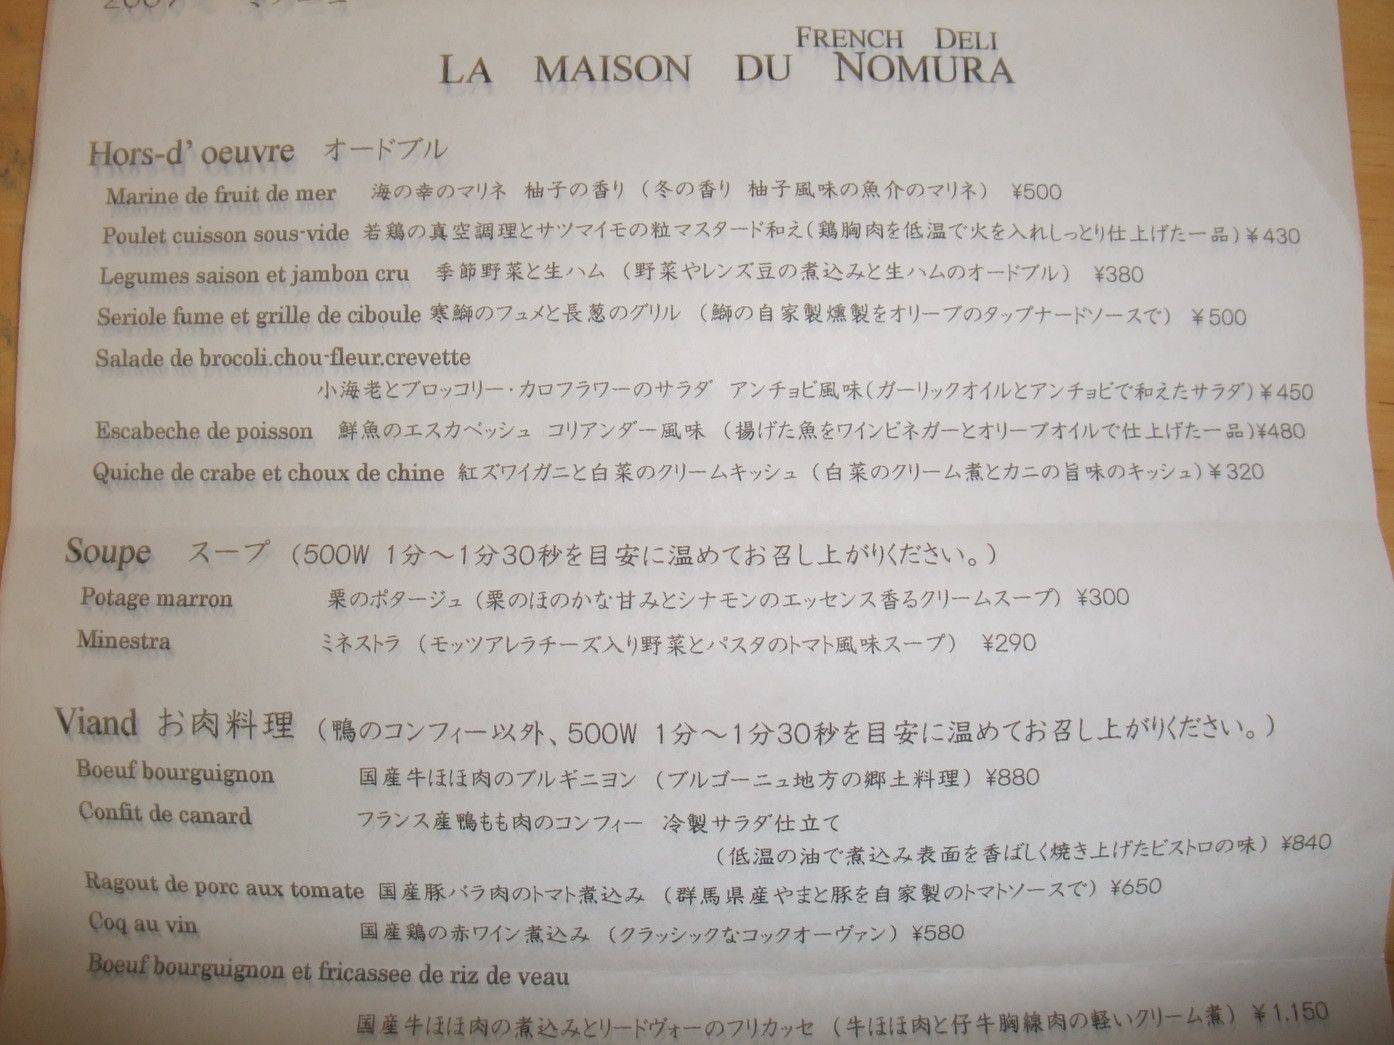 LA MAISON DU NOMURA